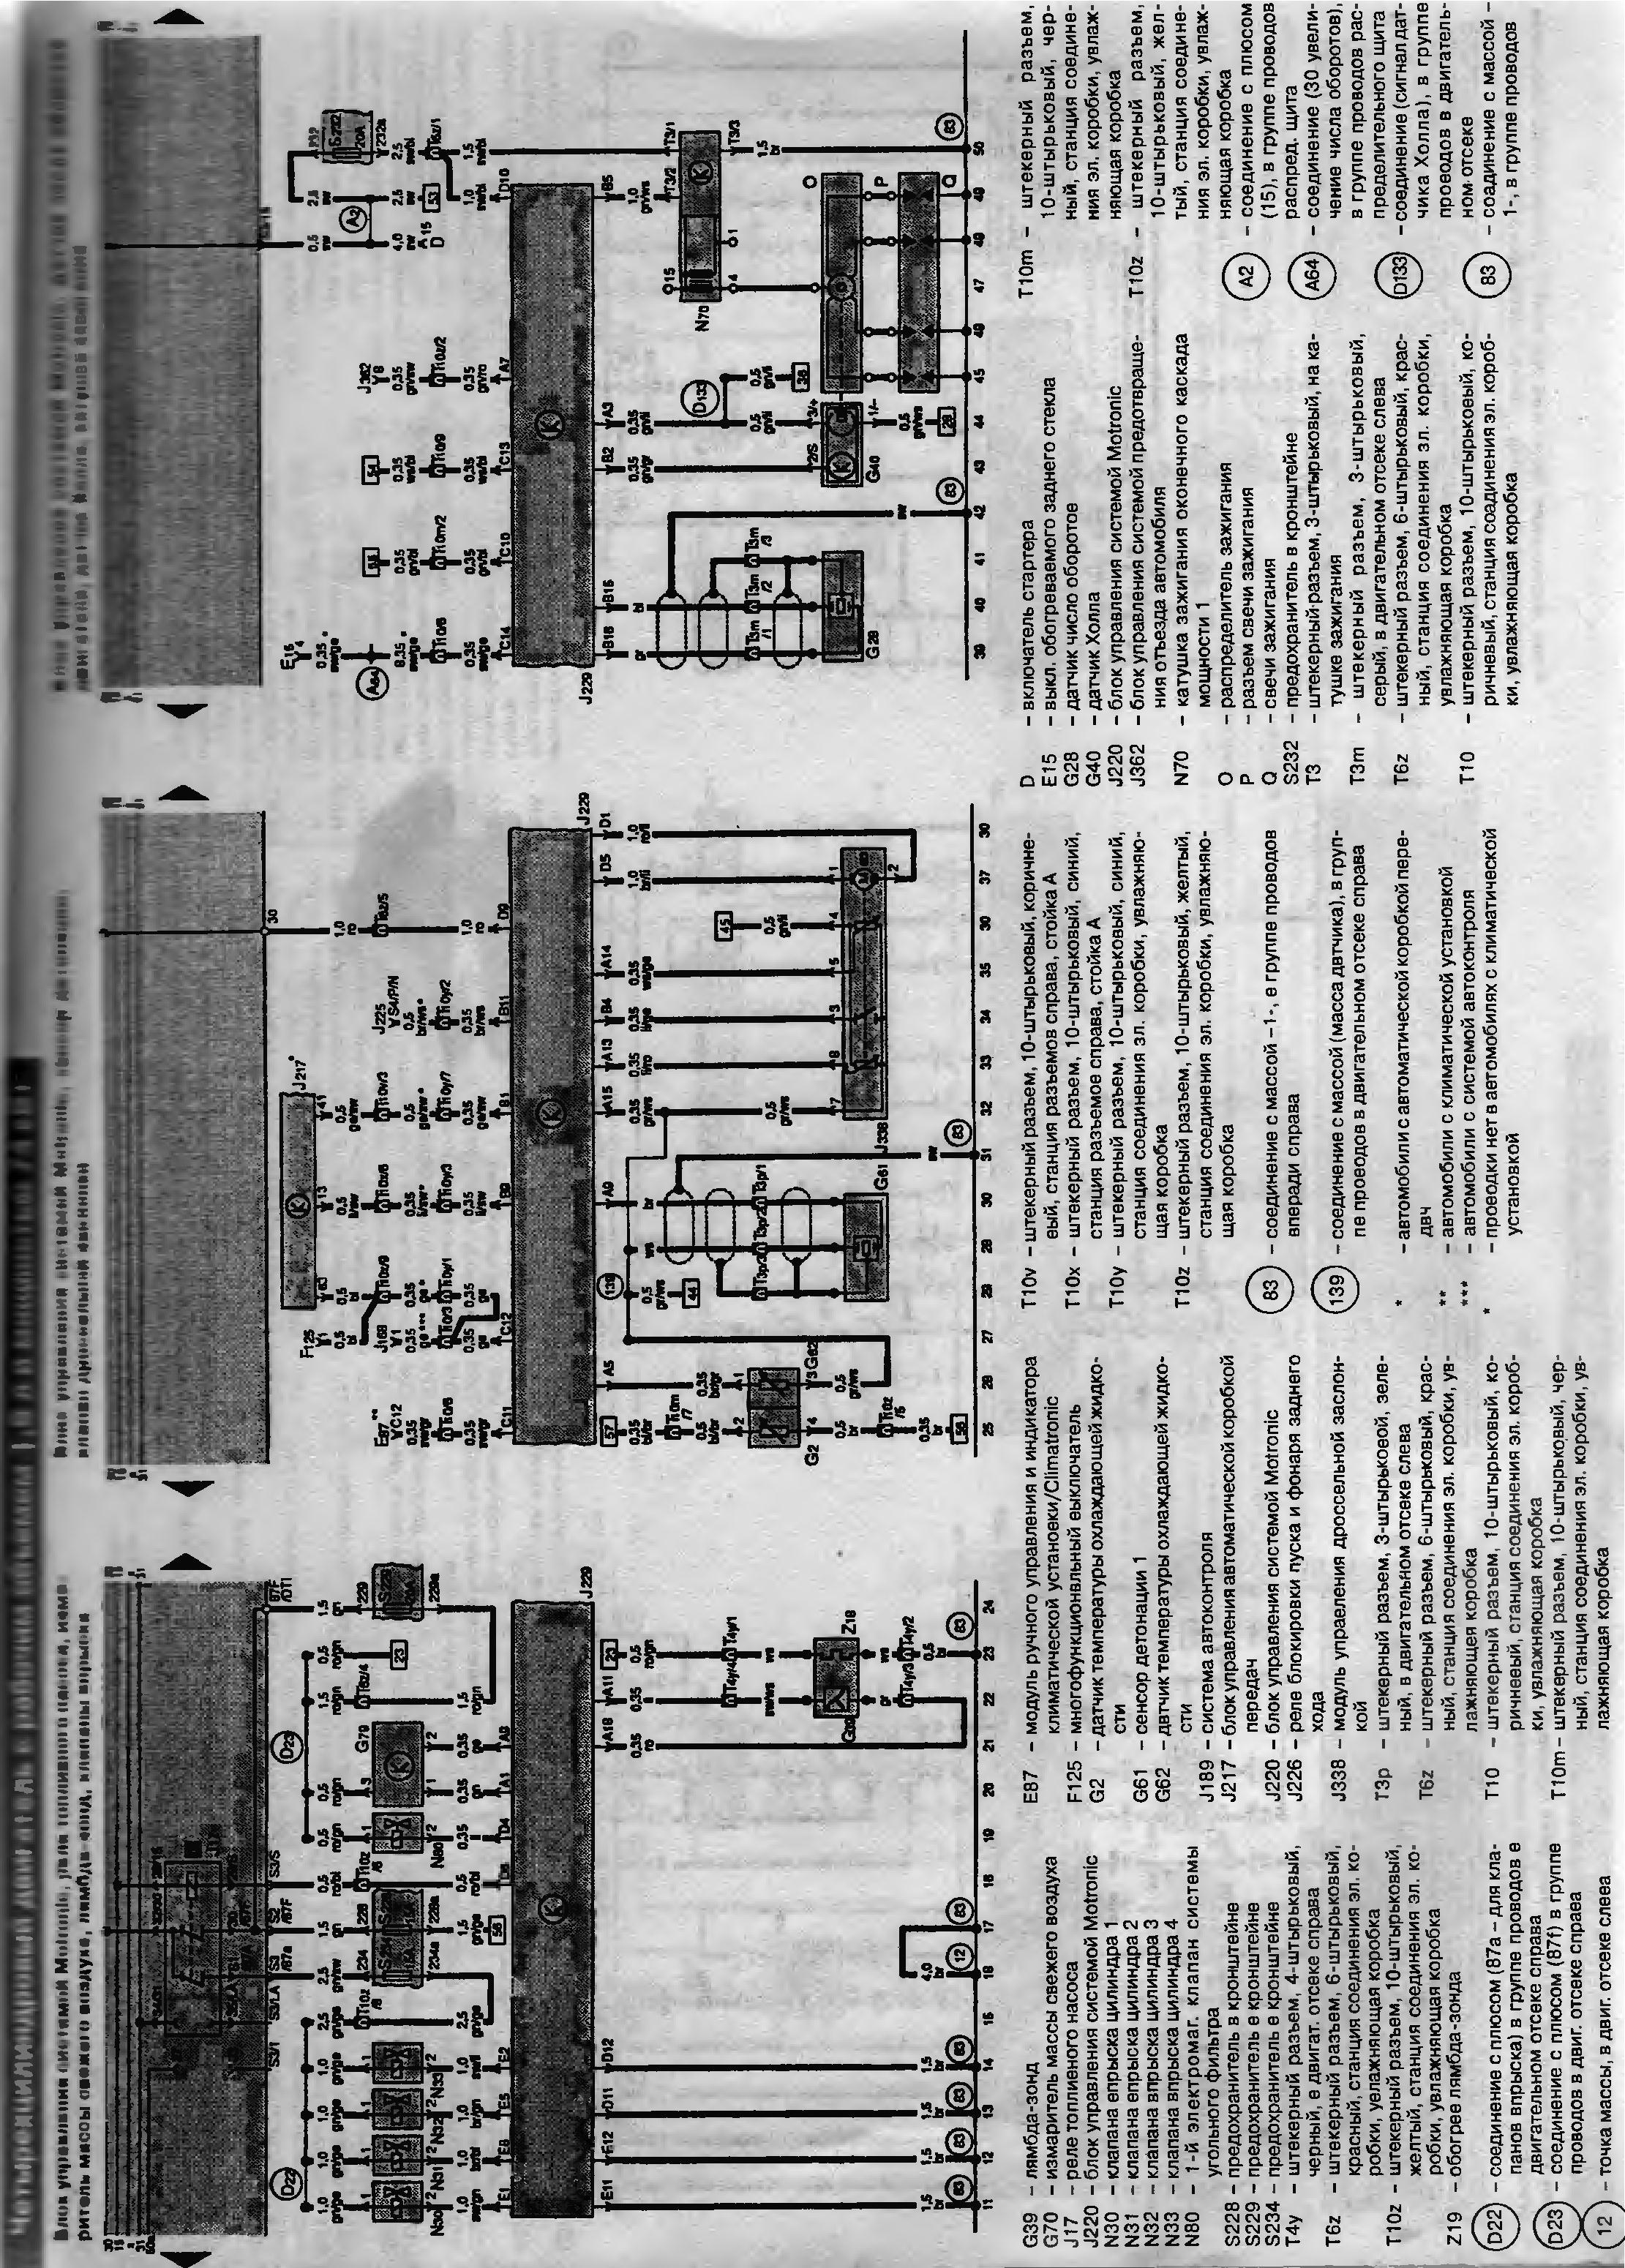 Схема электрооборудования audi-100 1994г | Схемы усилителей: http://sytrade.ru/shema-e-lektrooborudovaniya-audi-100-1994g/